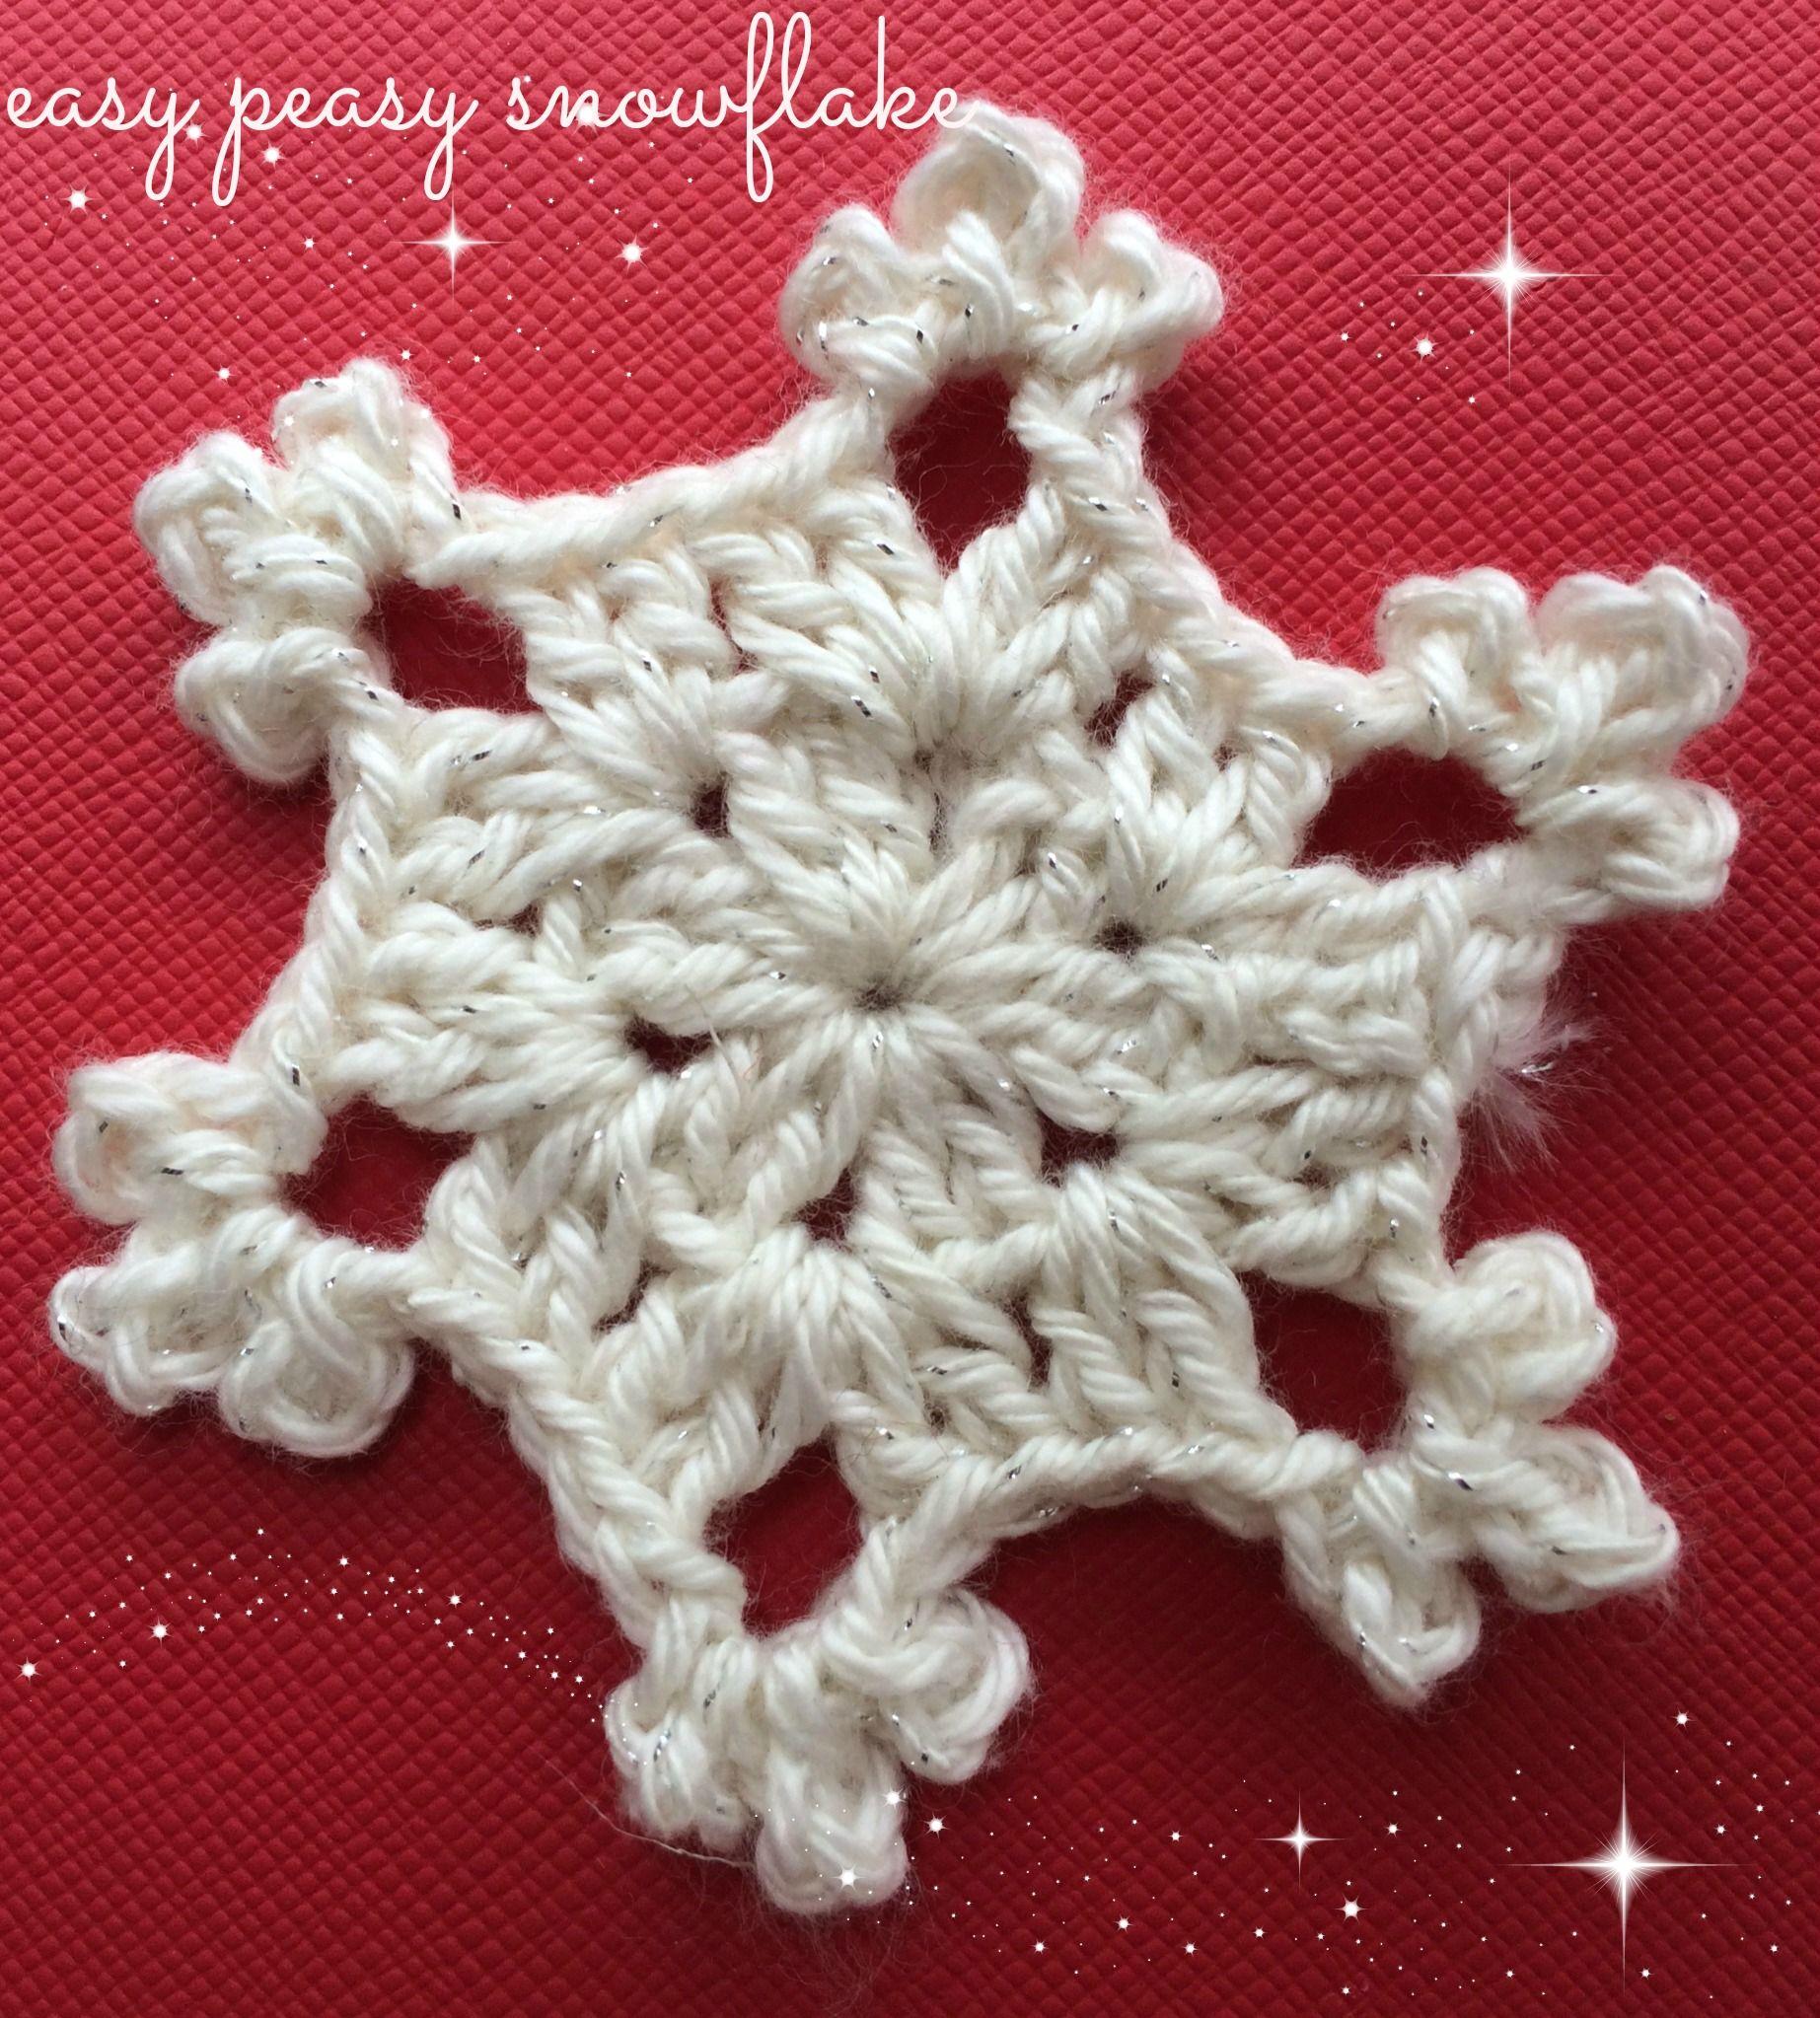 Pin by Friederike Theobald on Weihnachten | Pinterest | Easy peasy ...